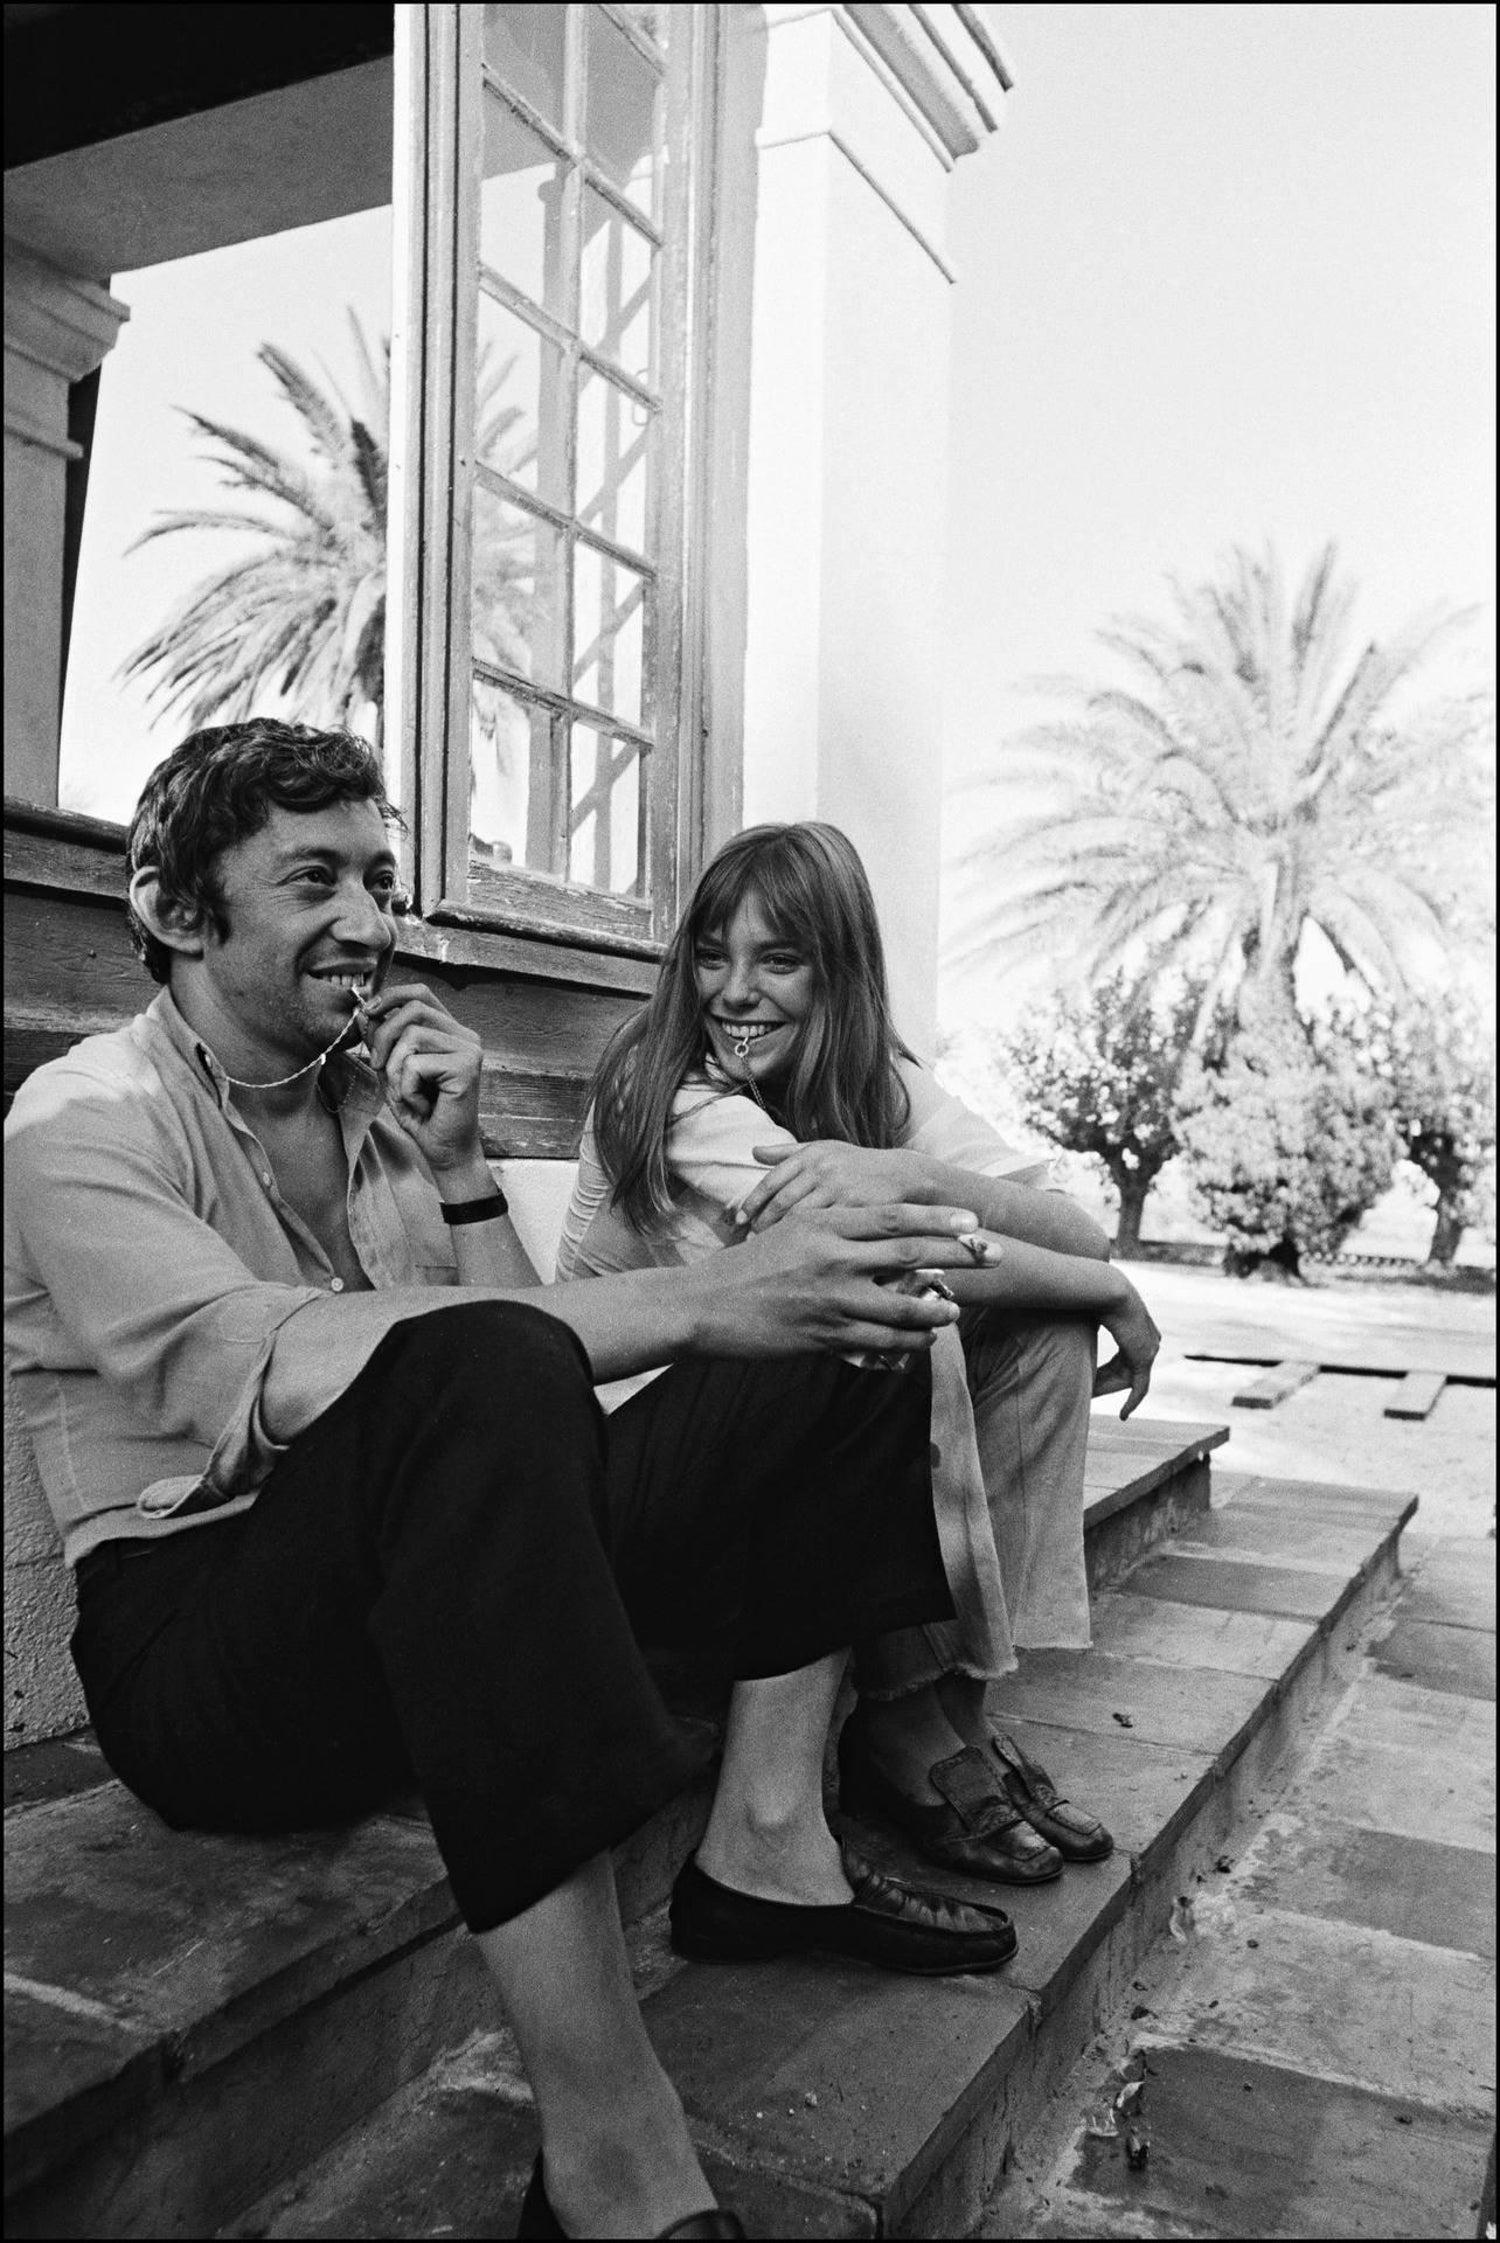 Jean-Pierre Bonnotte - 'Gainsbourg et Birkin' La Piscine at 1stdibs